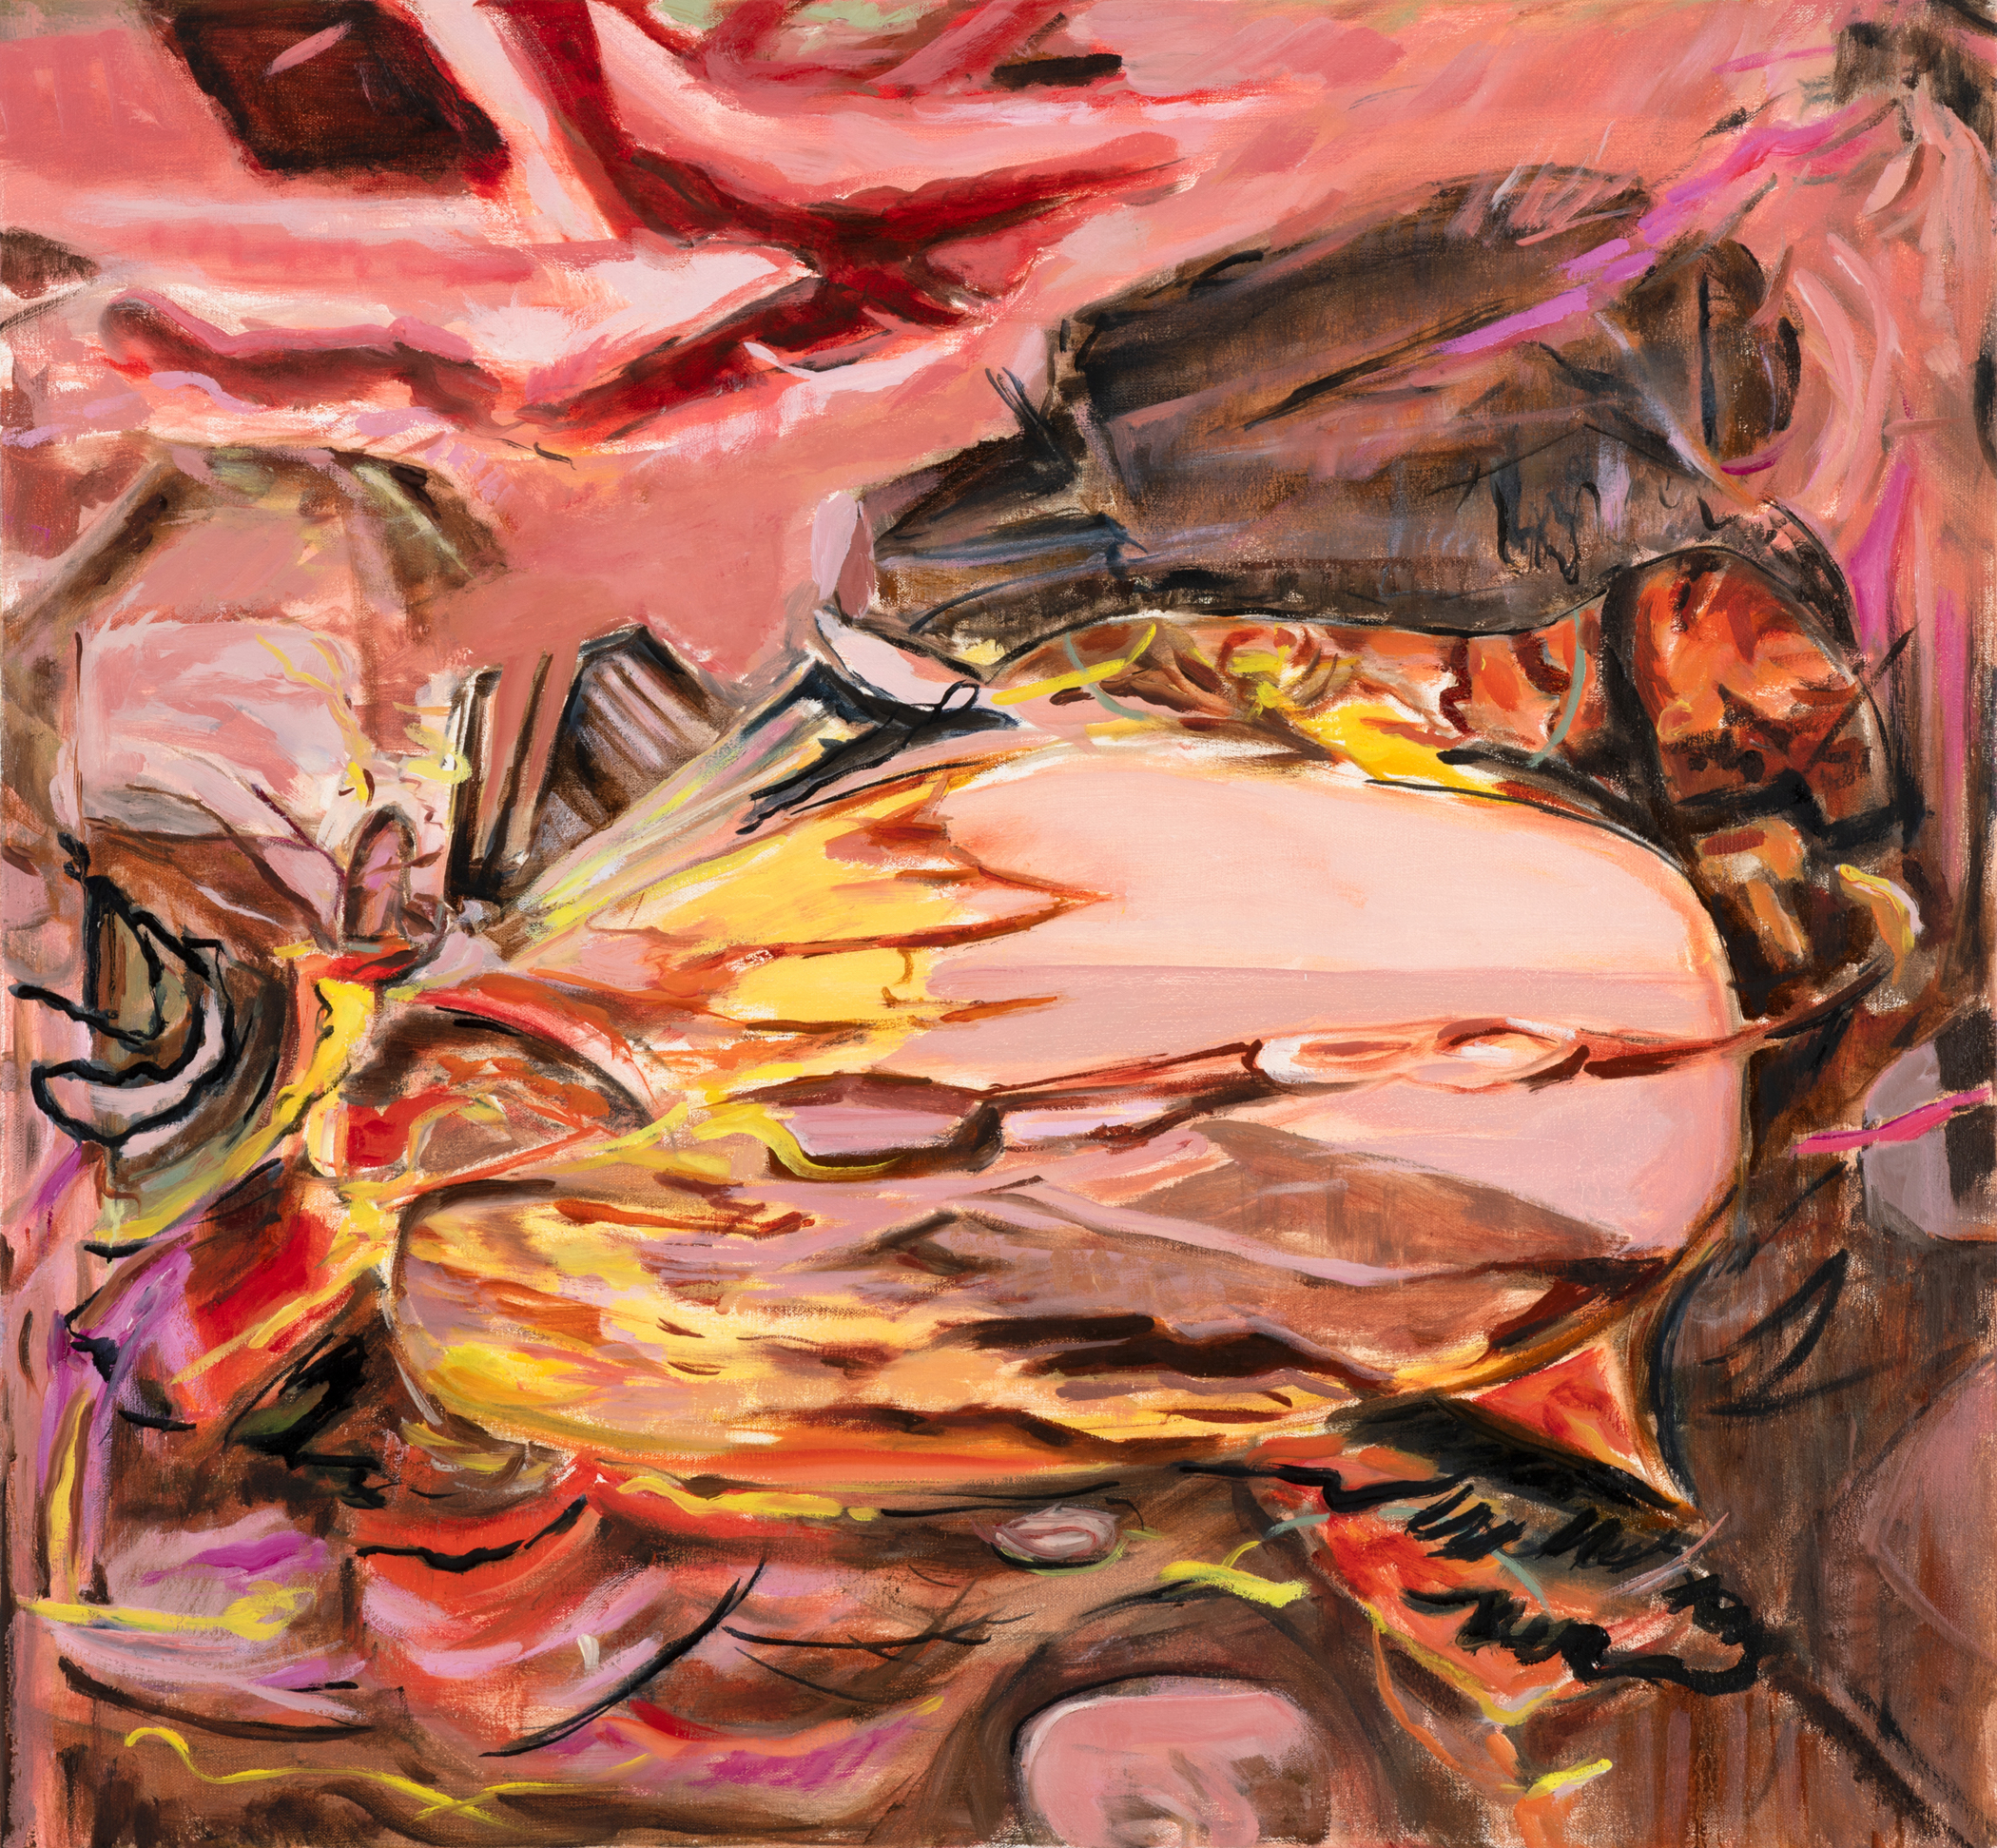 Kolman & Pryor Gallery_Jil Evans_Heart Bright Dark 3_2019_oil on canvas_30 x 32 inches_�2700.jpg